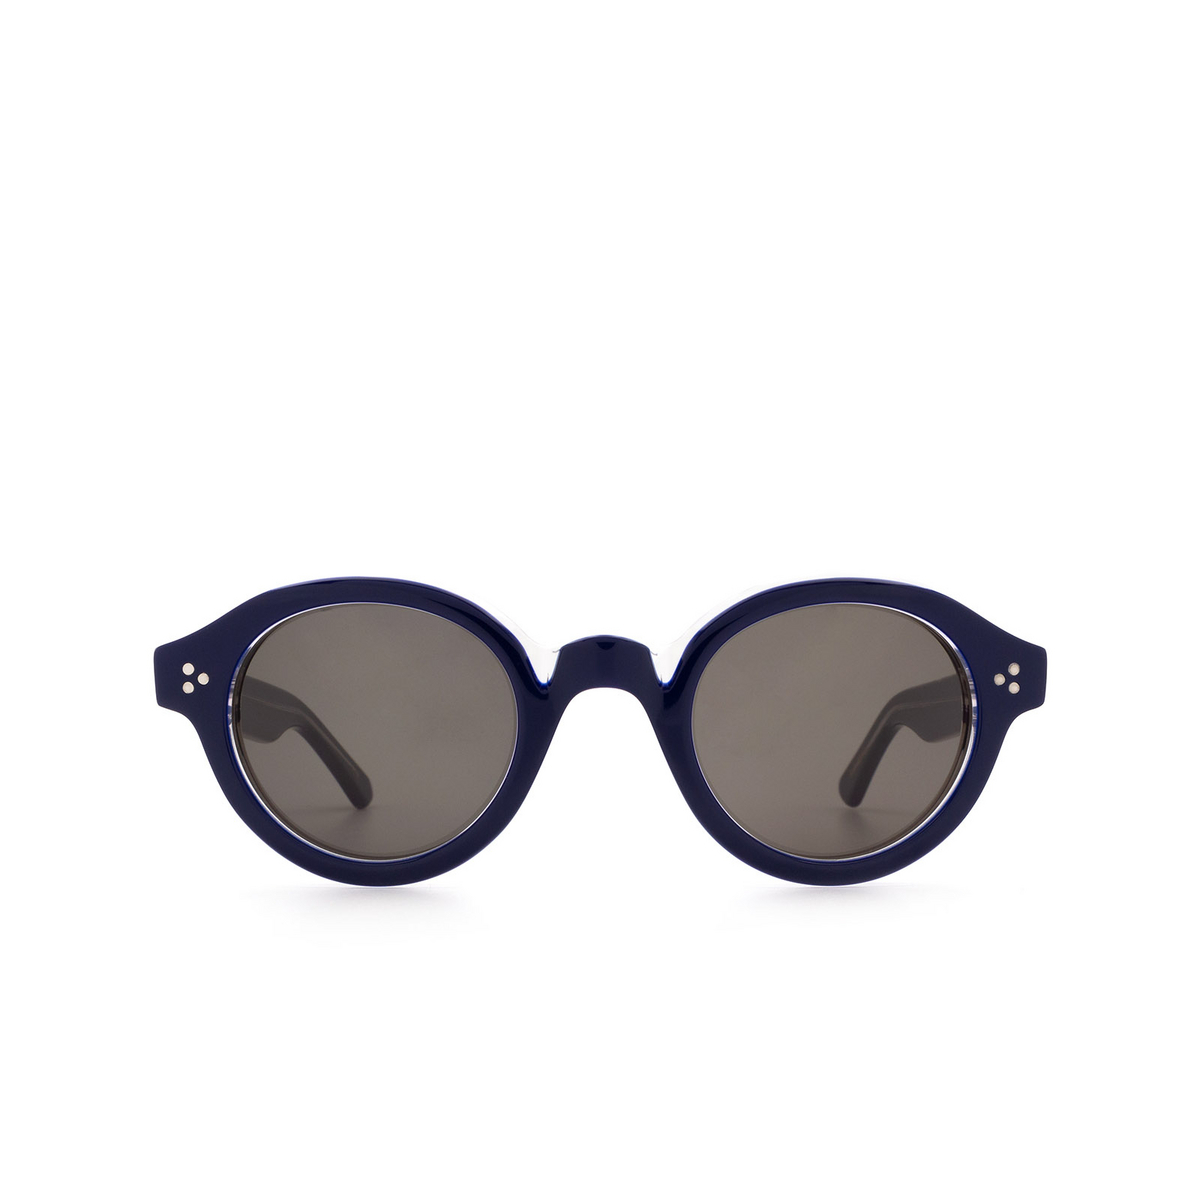 Lesca® Round Sunglasses: La Corbs color Blue 20108 - front view.